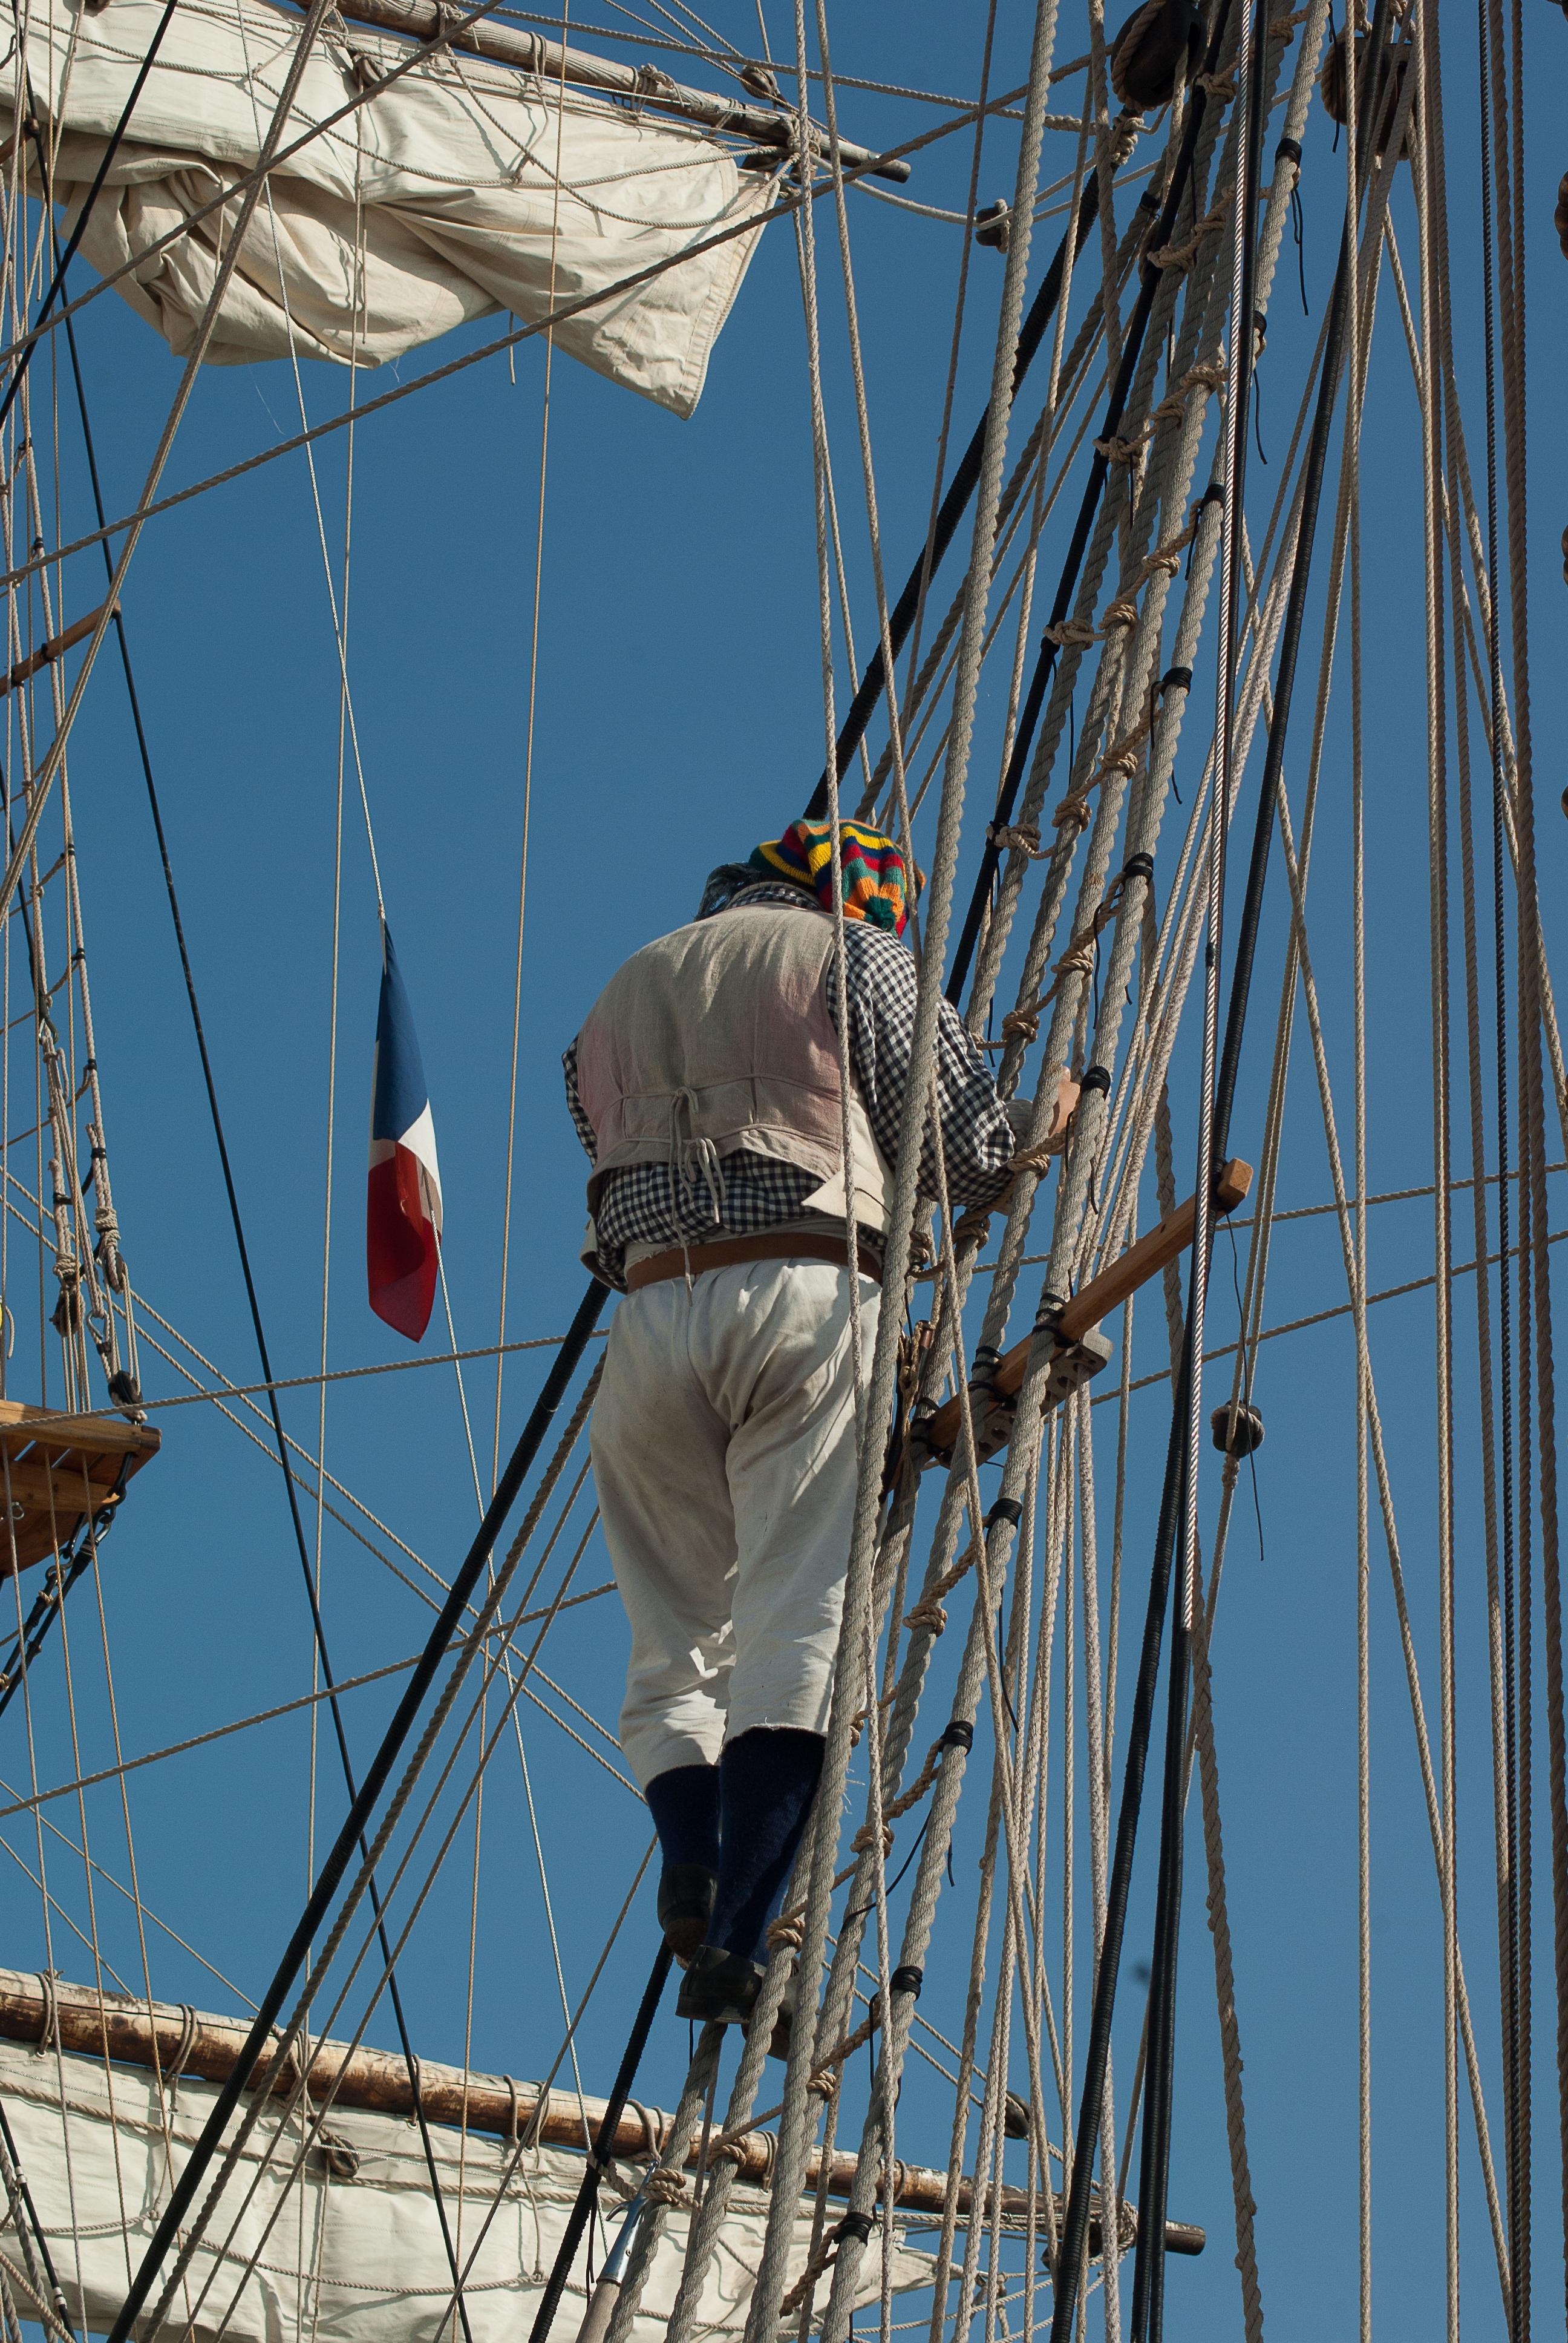 Free Images : boat, vehicle, mast, blue, sailboat, sail ... for Rope Ladder Ship  557yll